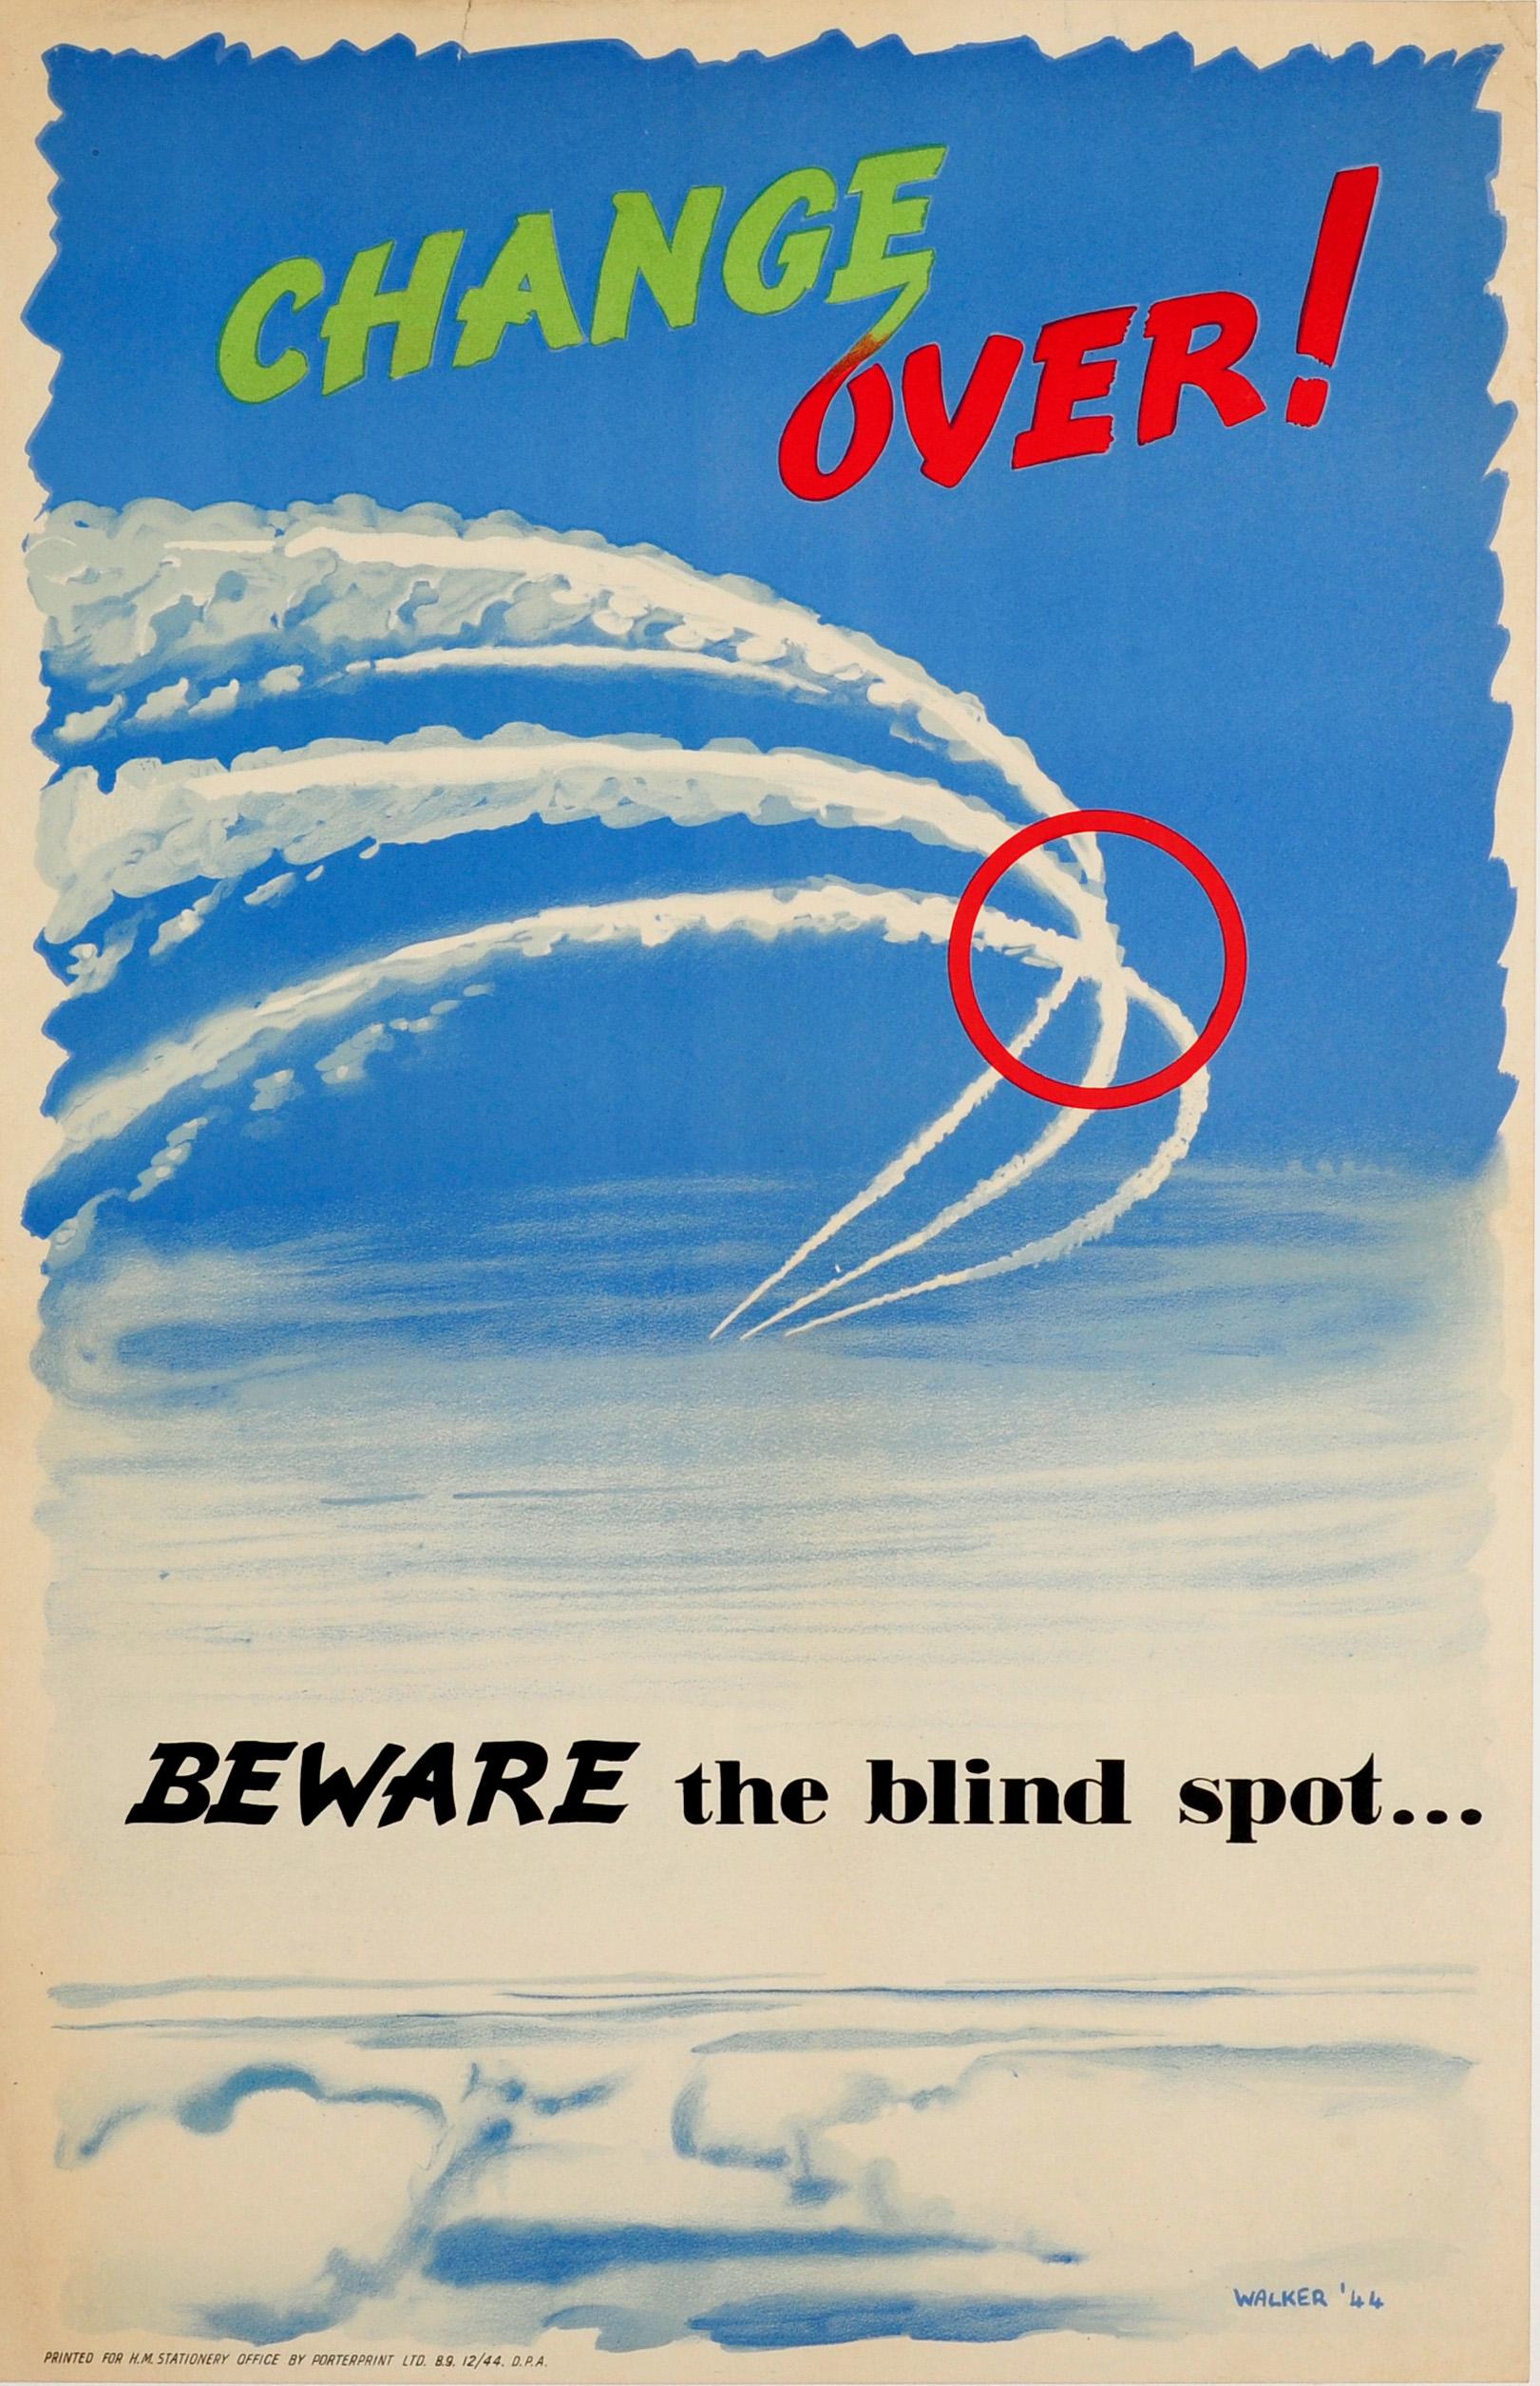 Lot 33 - Propaganda Poster Air Force Pilot Safety Blind Spot UK